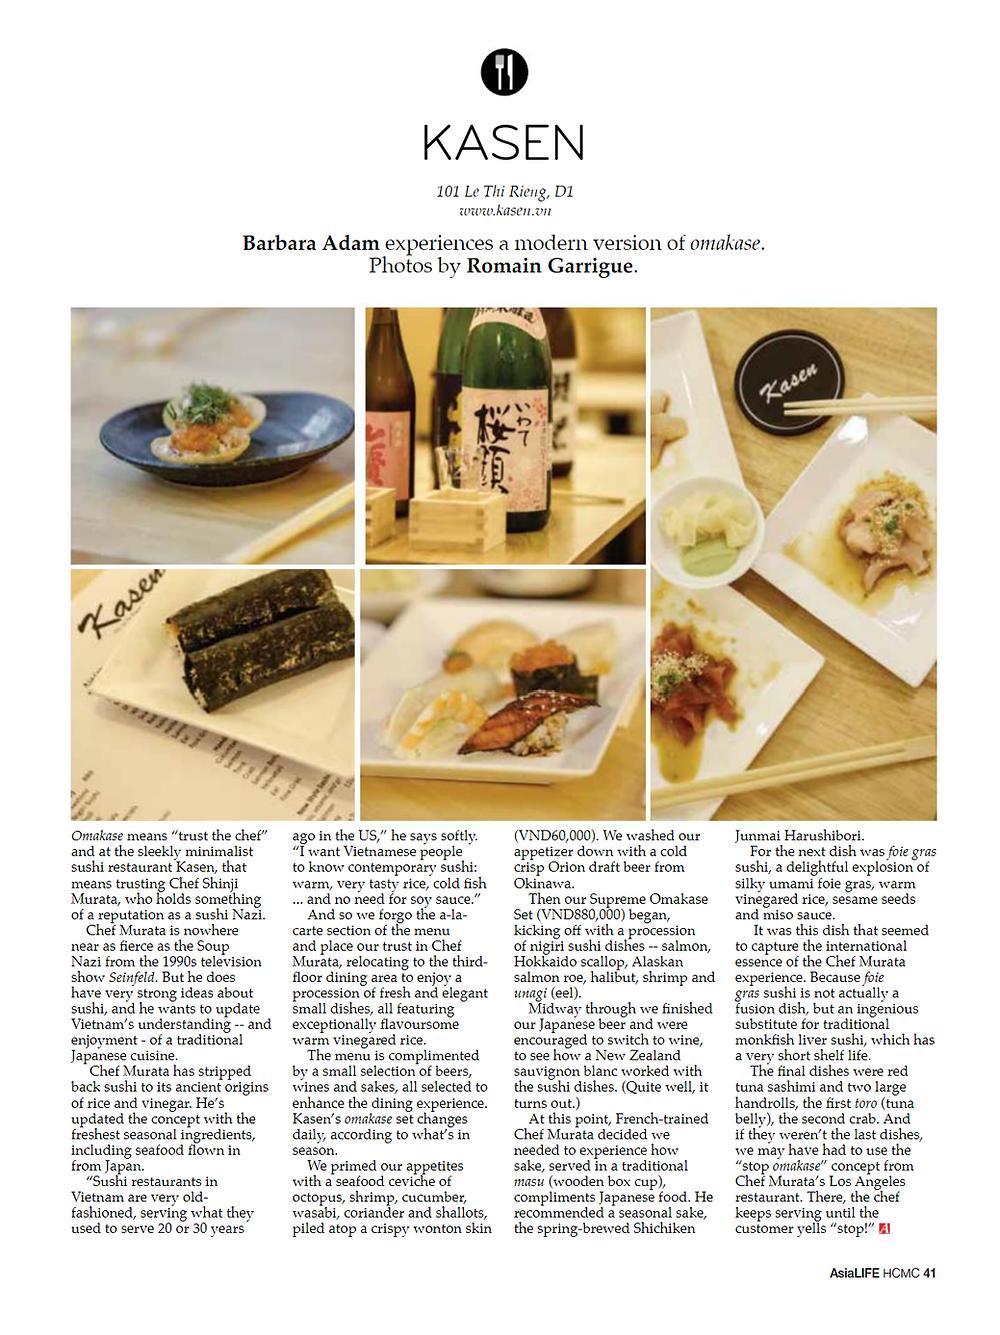 Kasen Omakase Sushi AsiaLIFE Vietnam Saihon Ho Chi Minh City District 1